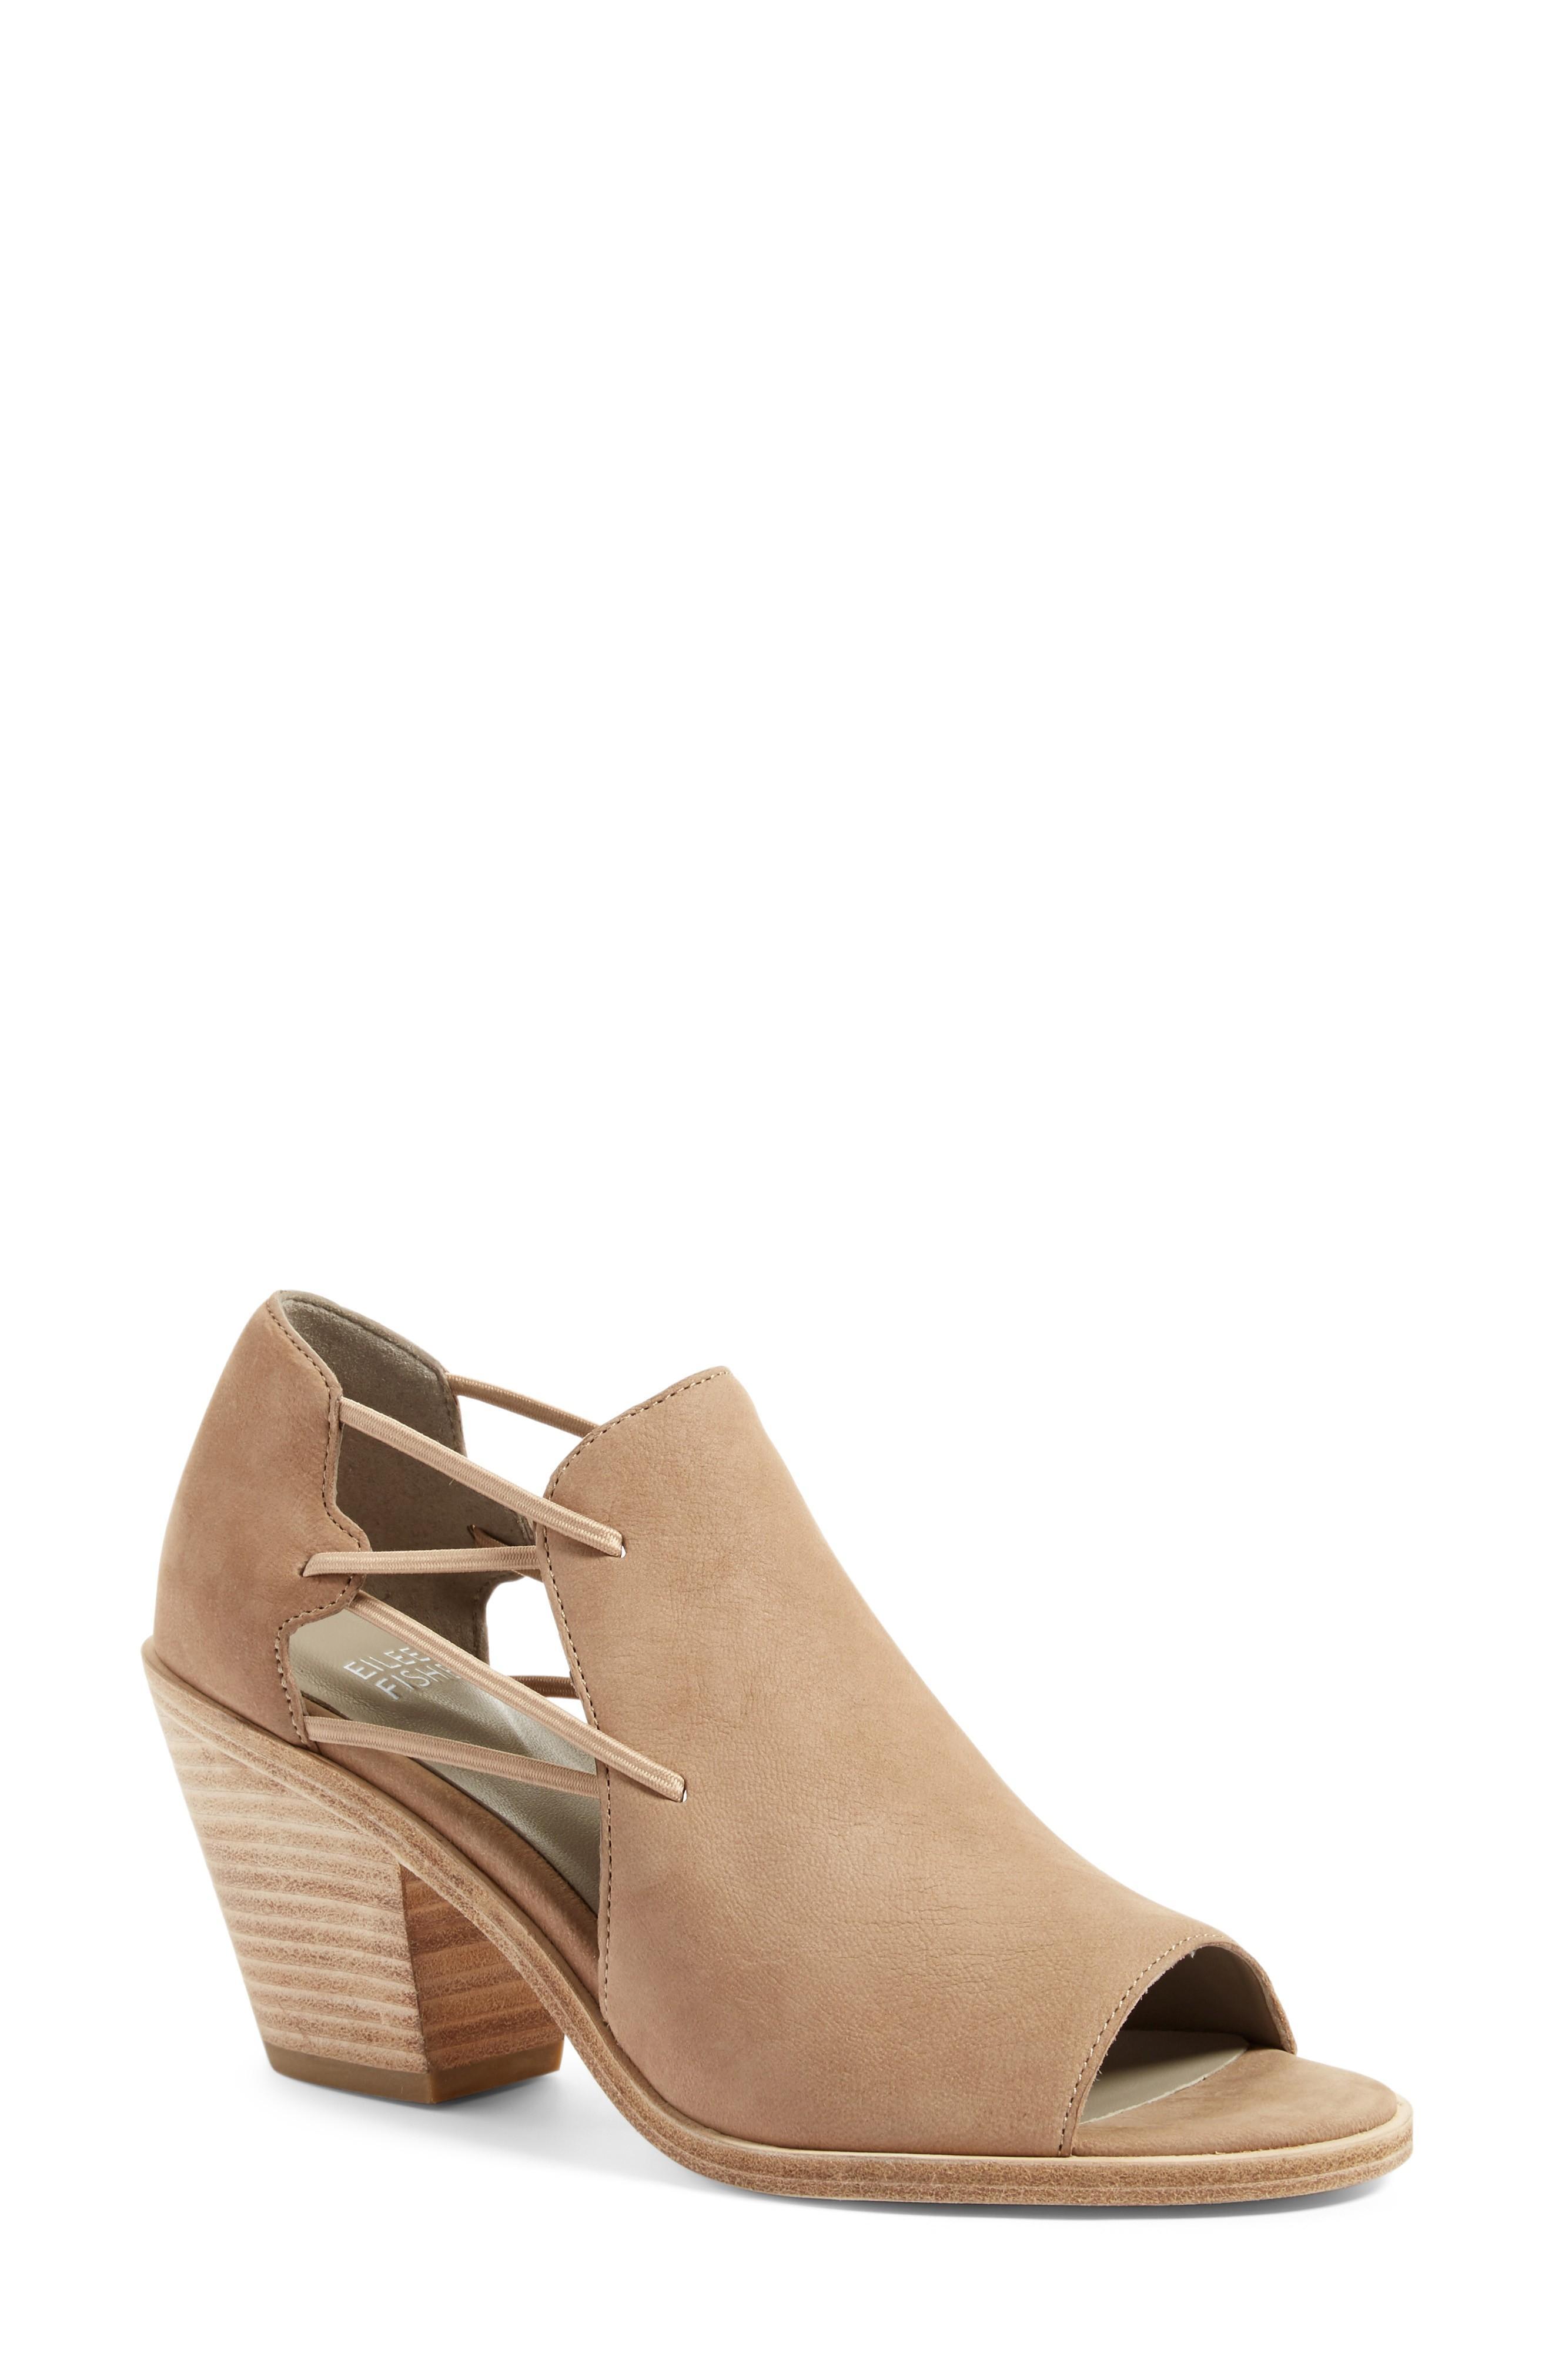 c37926c88b3 Nikki Peep Toe Sandal in Earth Leather